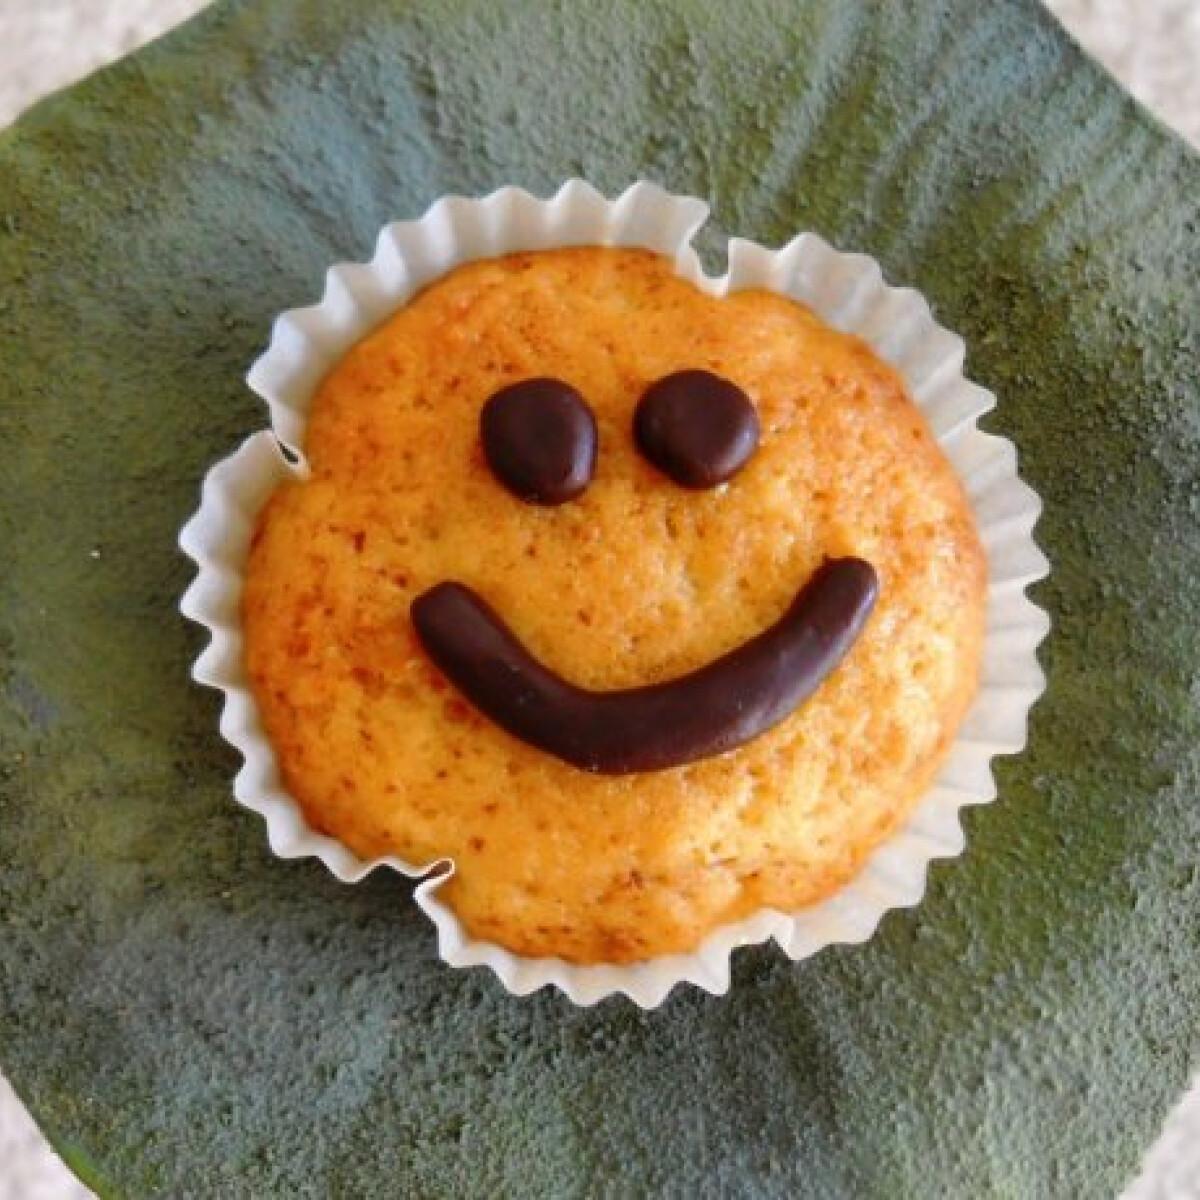 Ezen a képen: Citromos smiley muffin